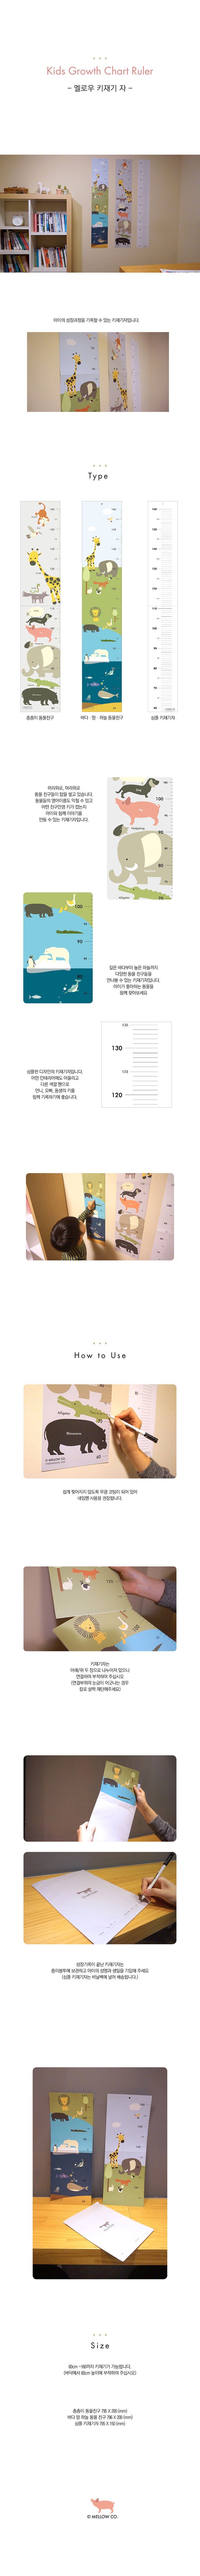 Kids Growth Chart Ruler 멜로우 키재기 자 - 멜로우, 3,500원, 데코소품, 데코스티커/키재기